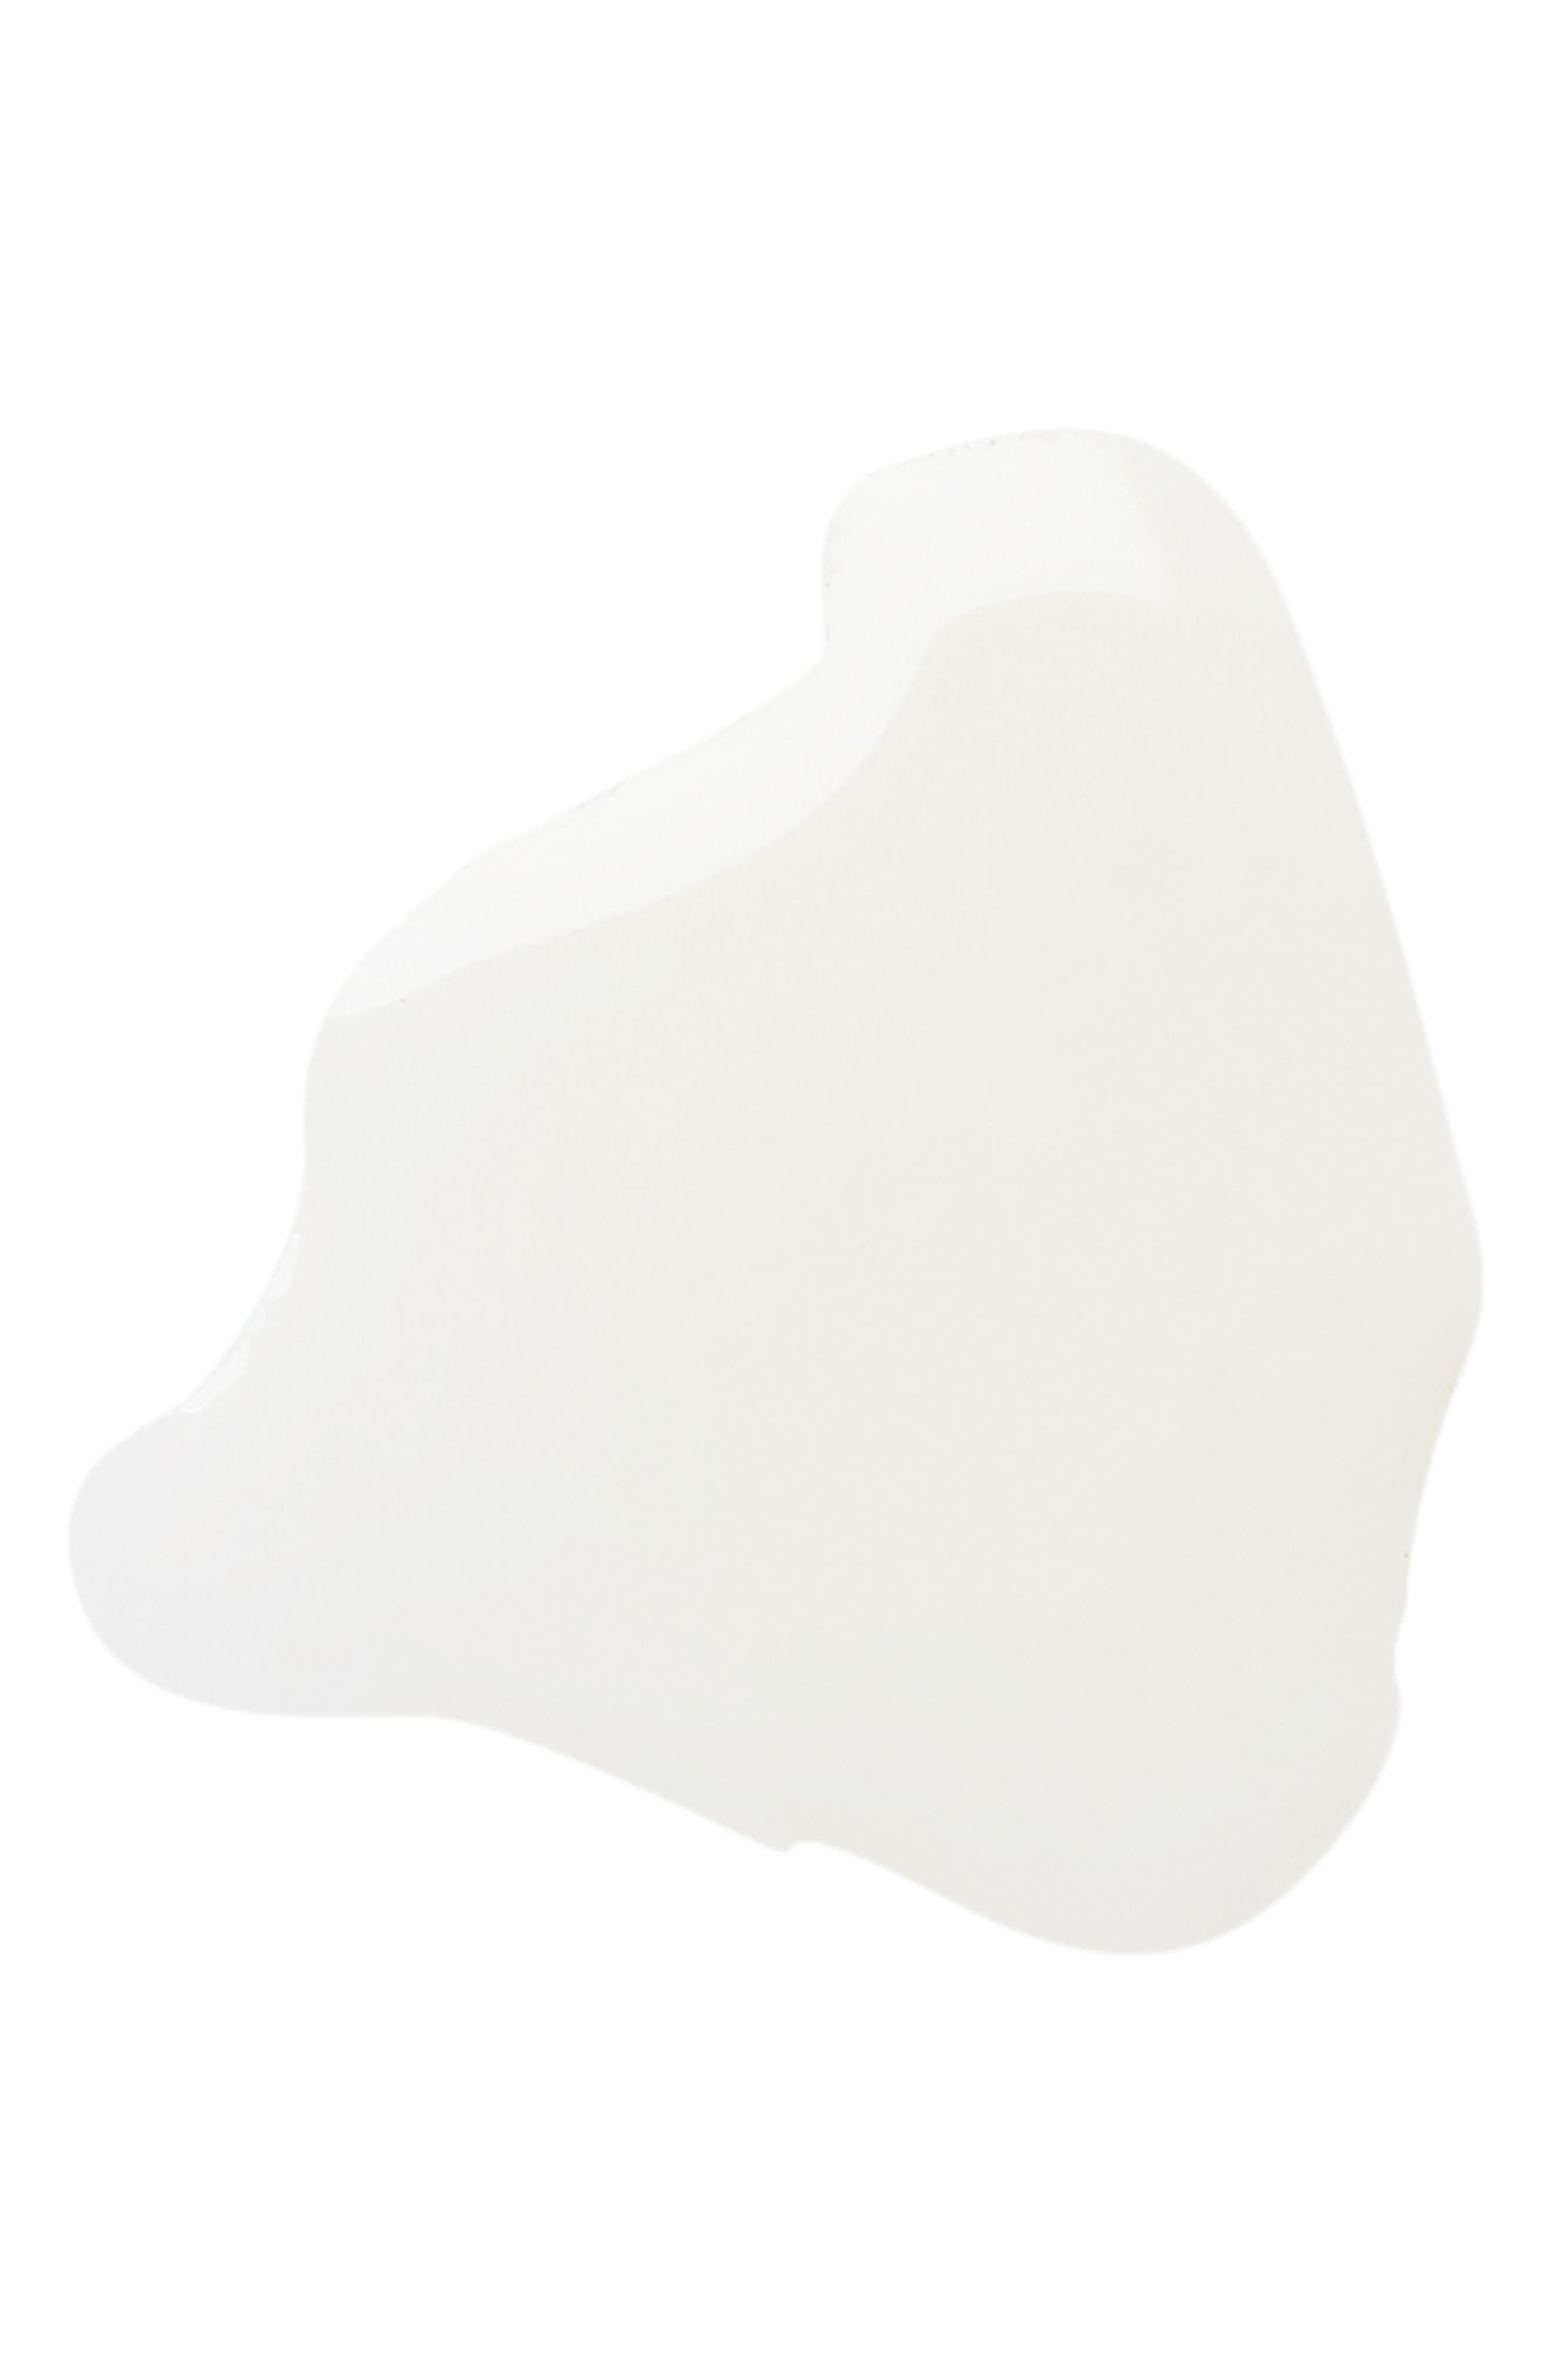 Resist C15 Super Booster,                             Alternate thumbnail 2, color,                             No Color